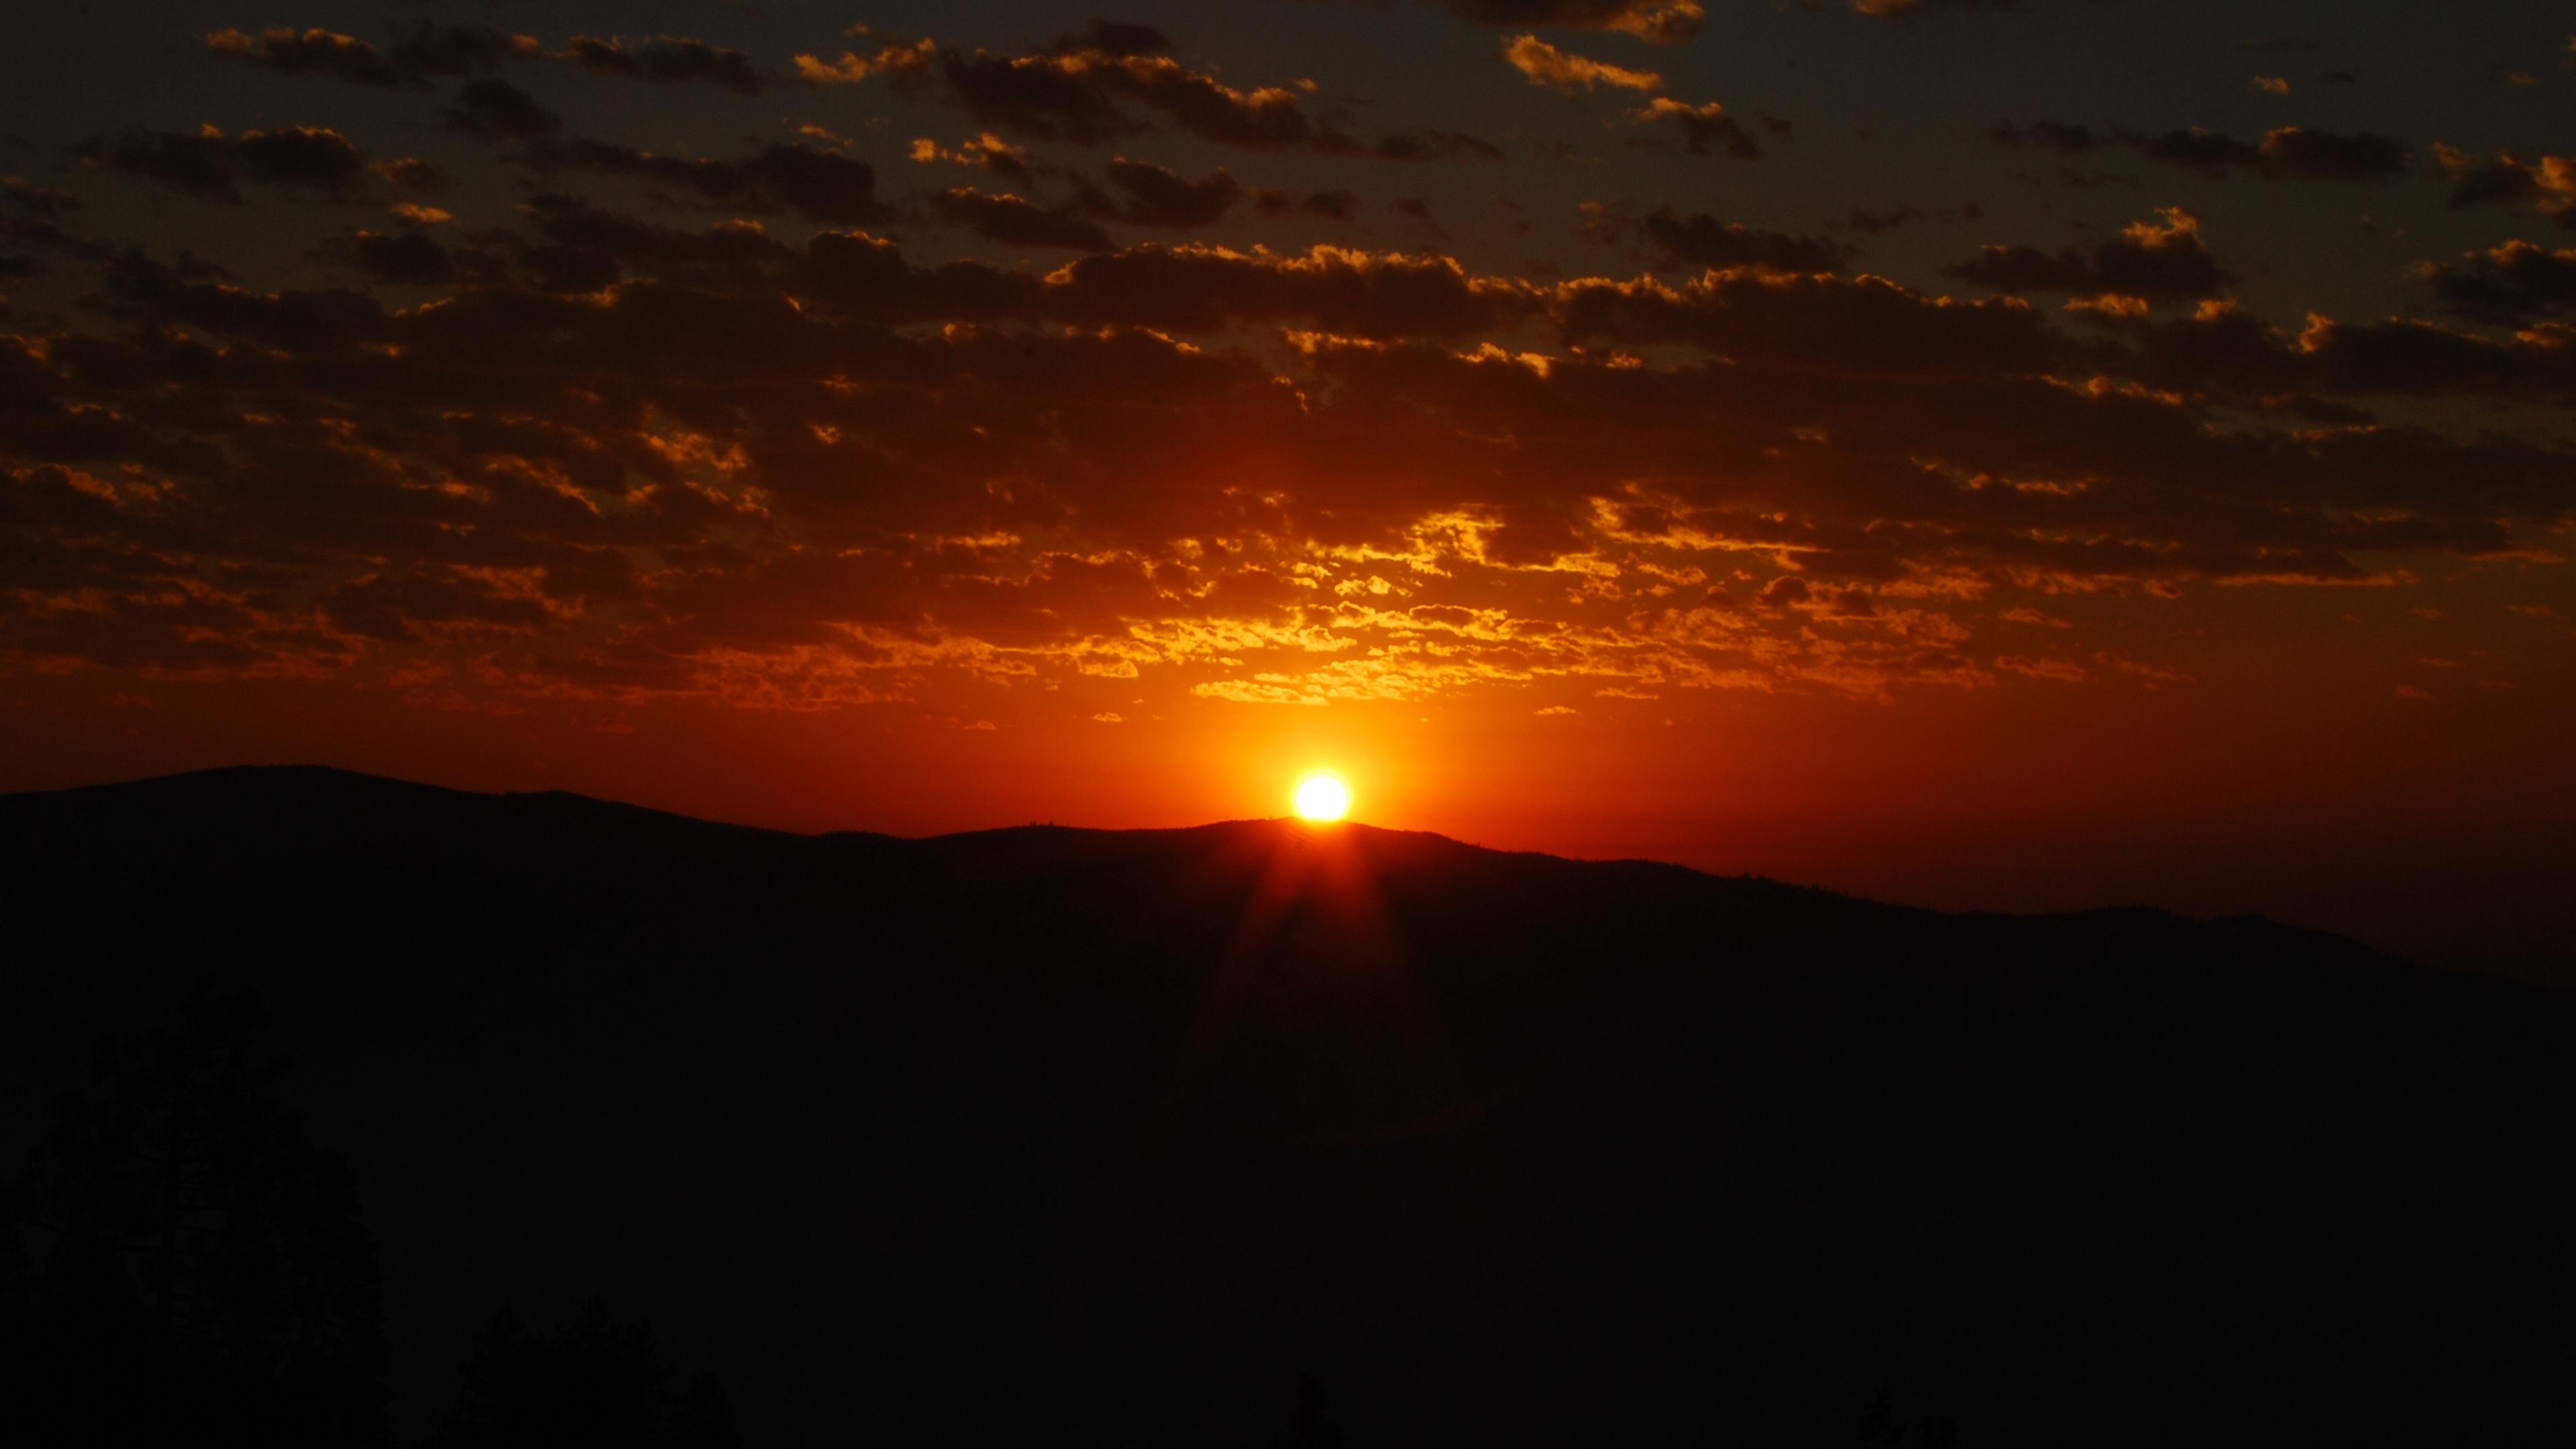 sunset horizon mountain clouds dark 4k 1541113521 - sunset, horizon, mountain, clouds, dark 4k - sunset, Mountain, Horizon